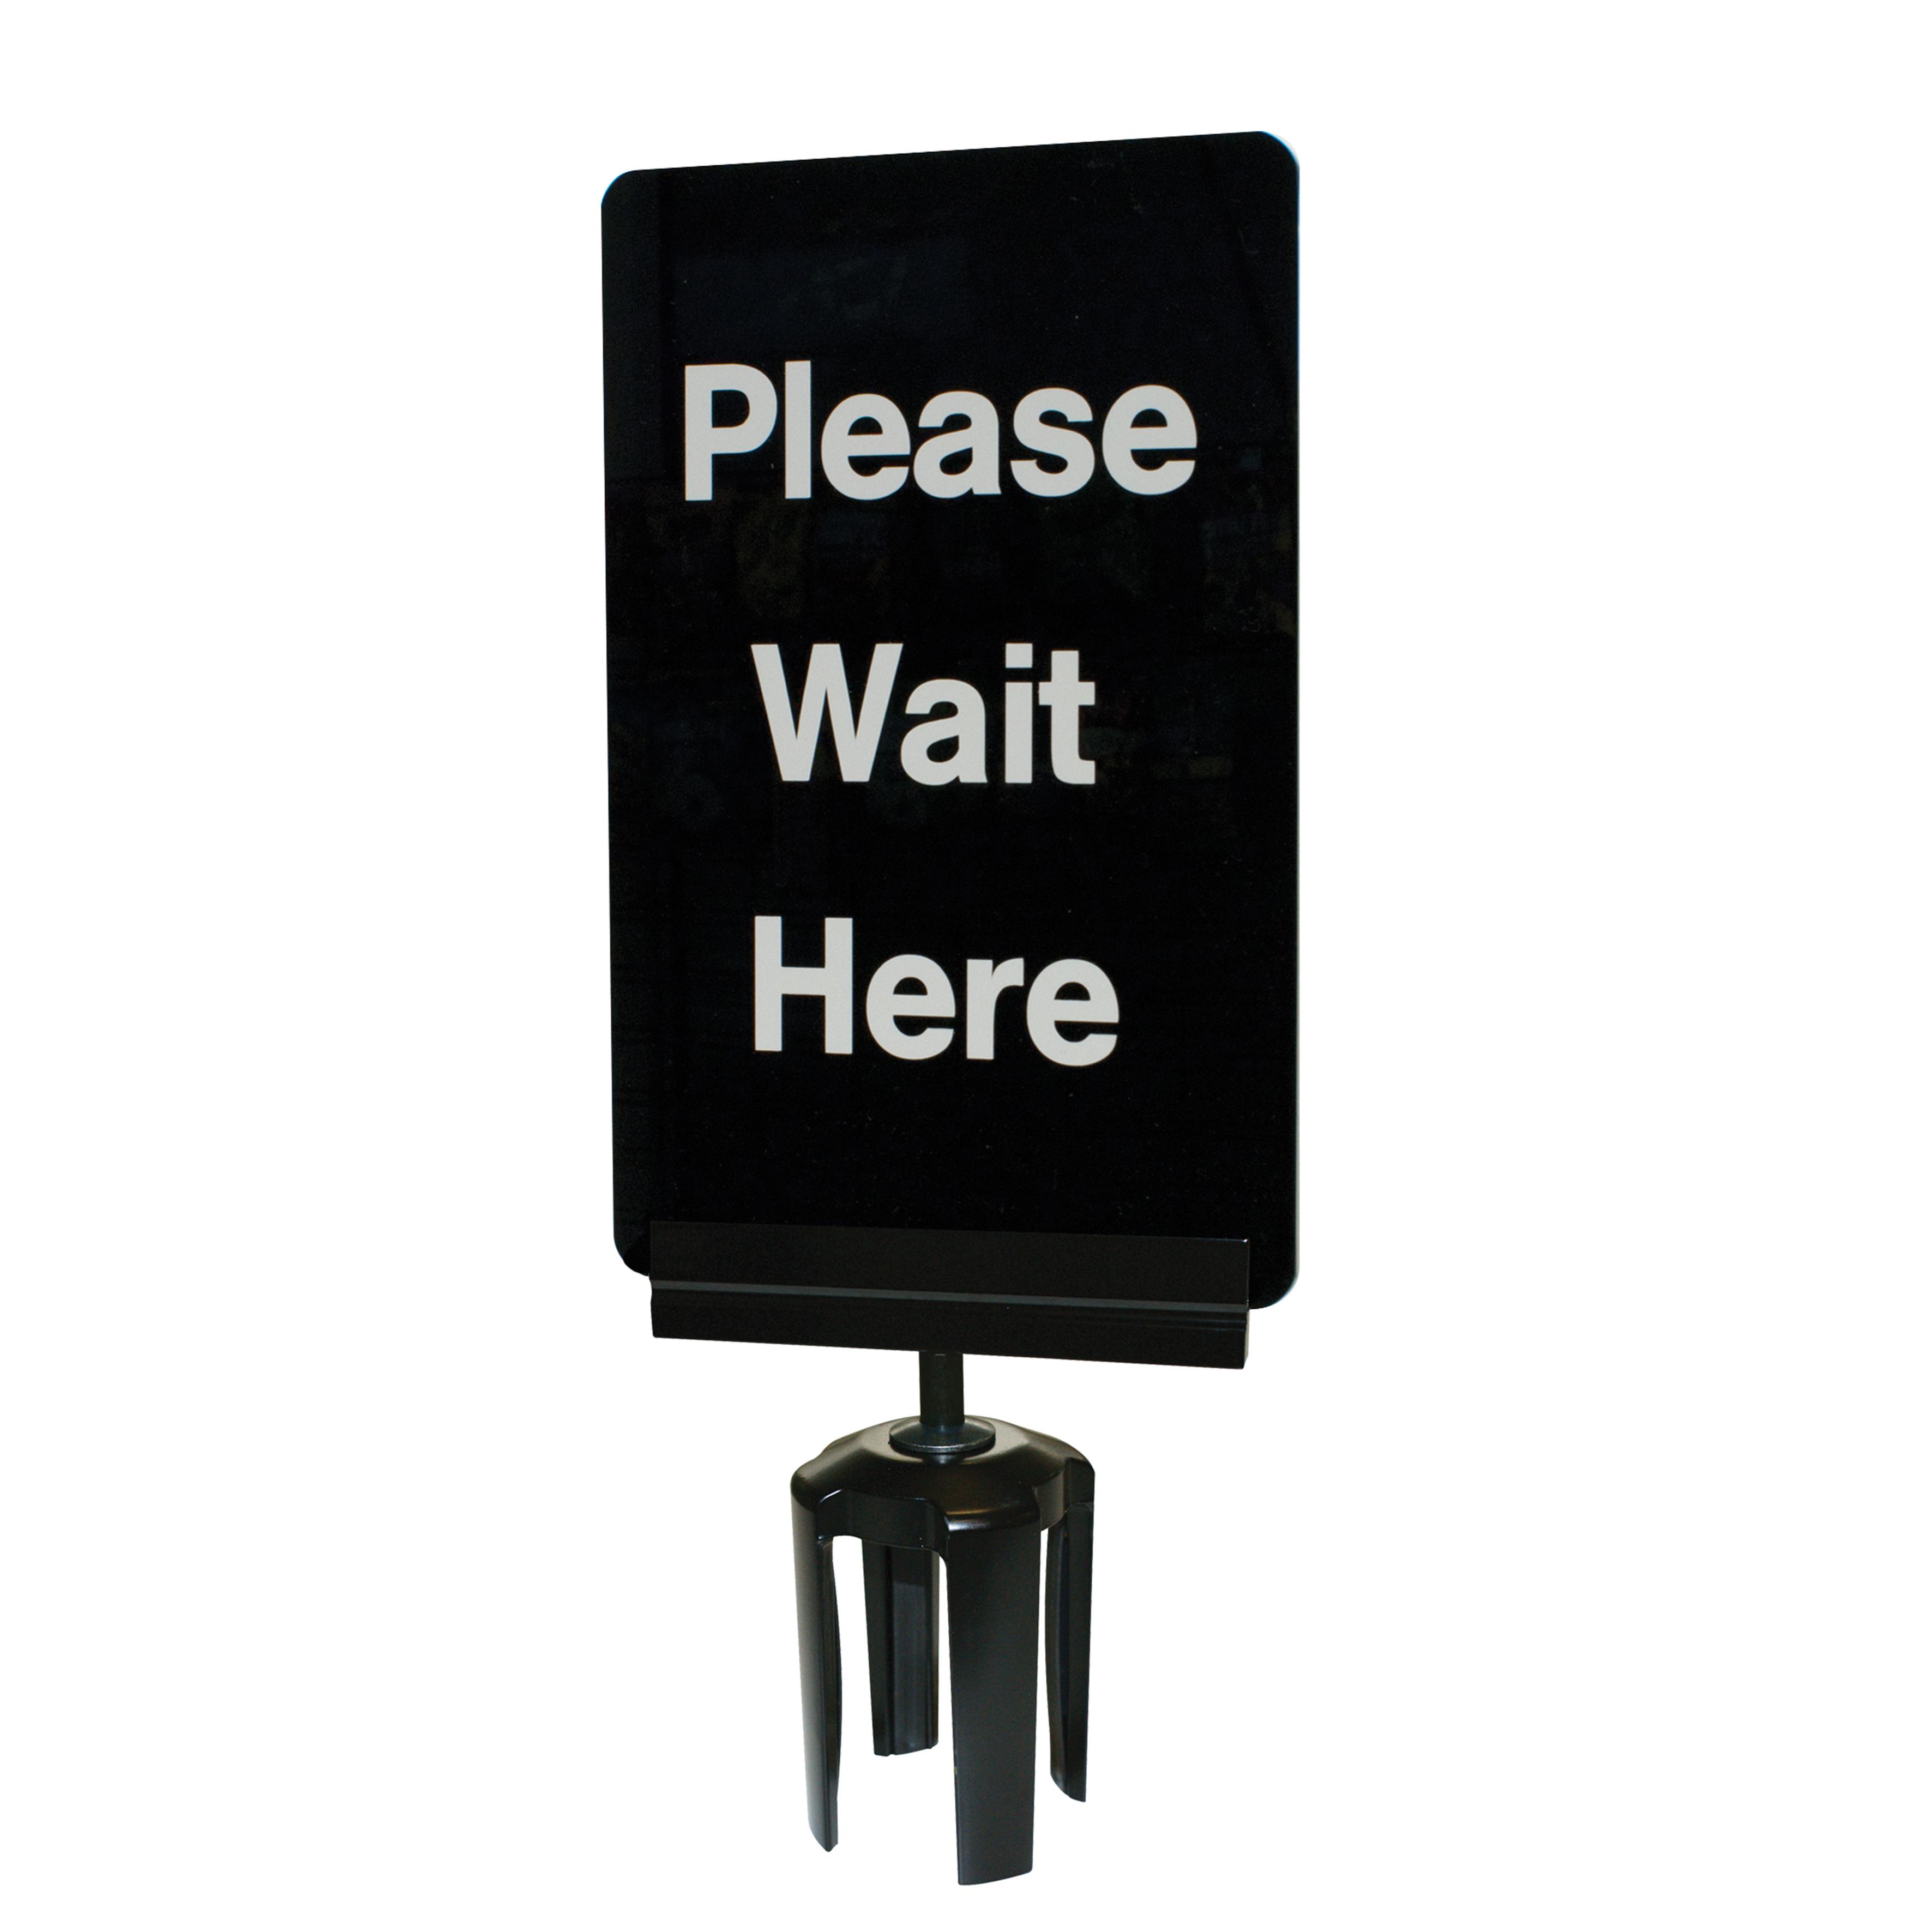 acrylic stanchion signage for tensabarrier  u2013 tensabarrier